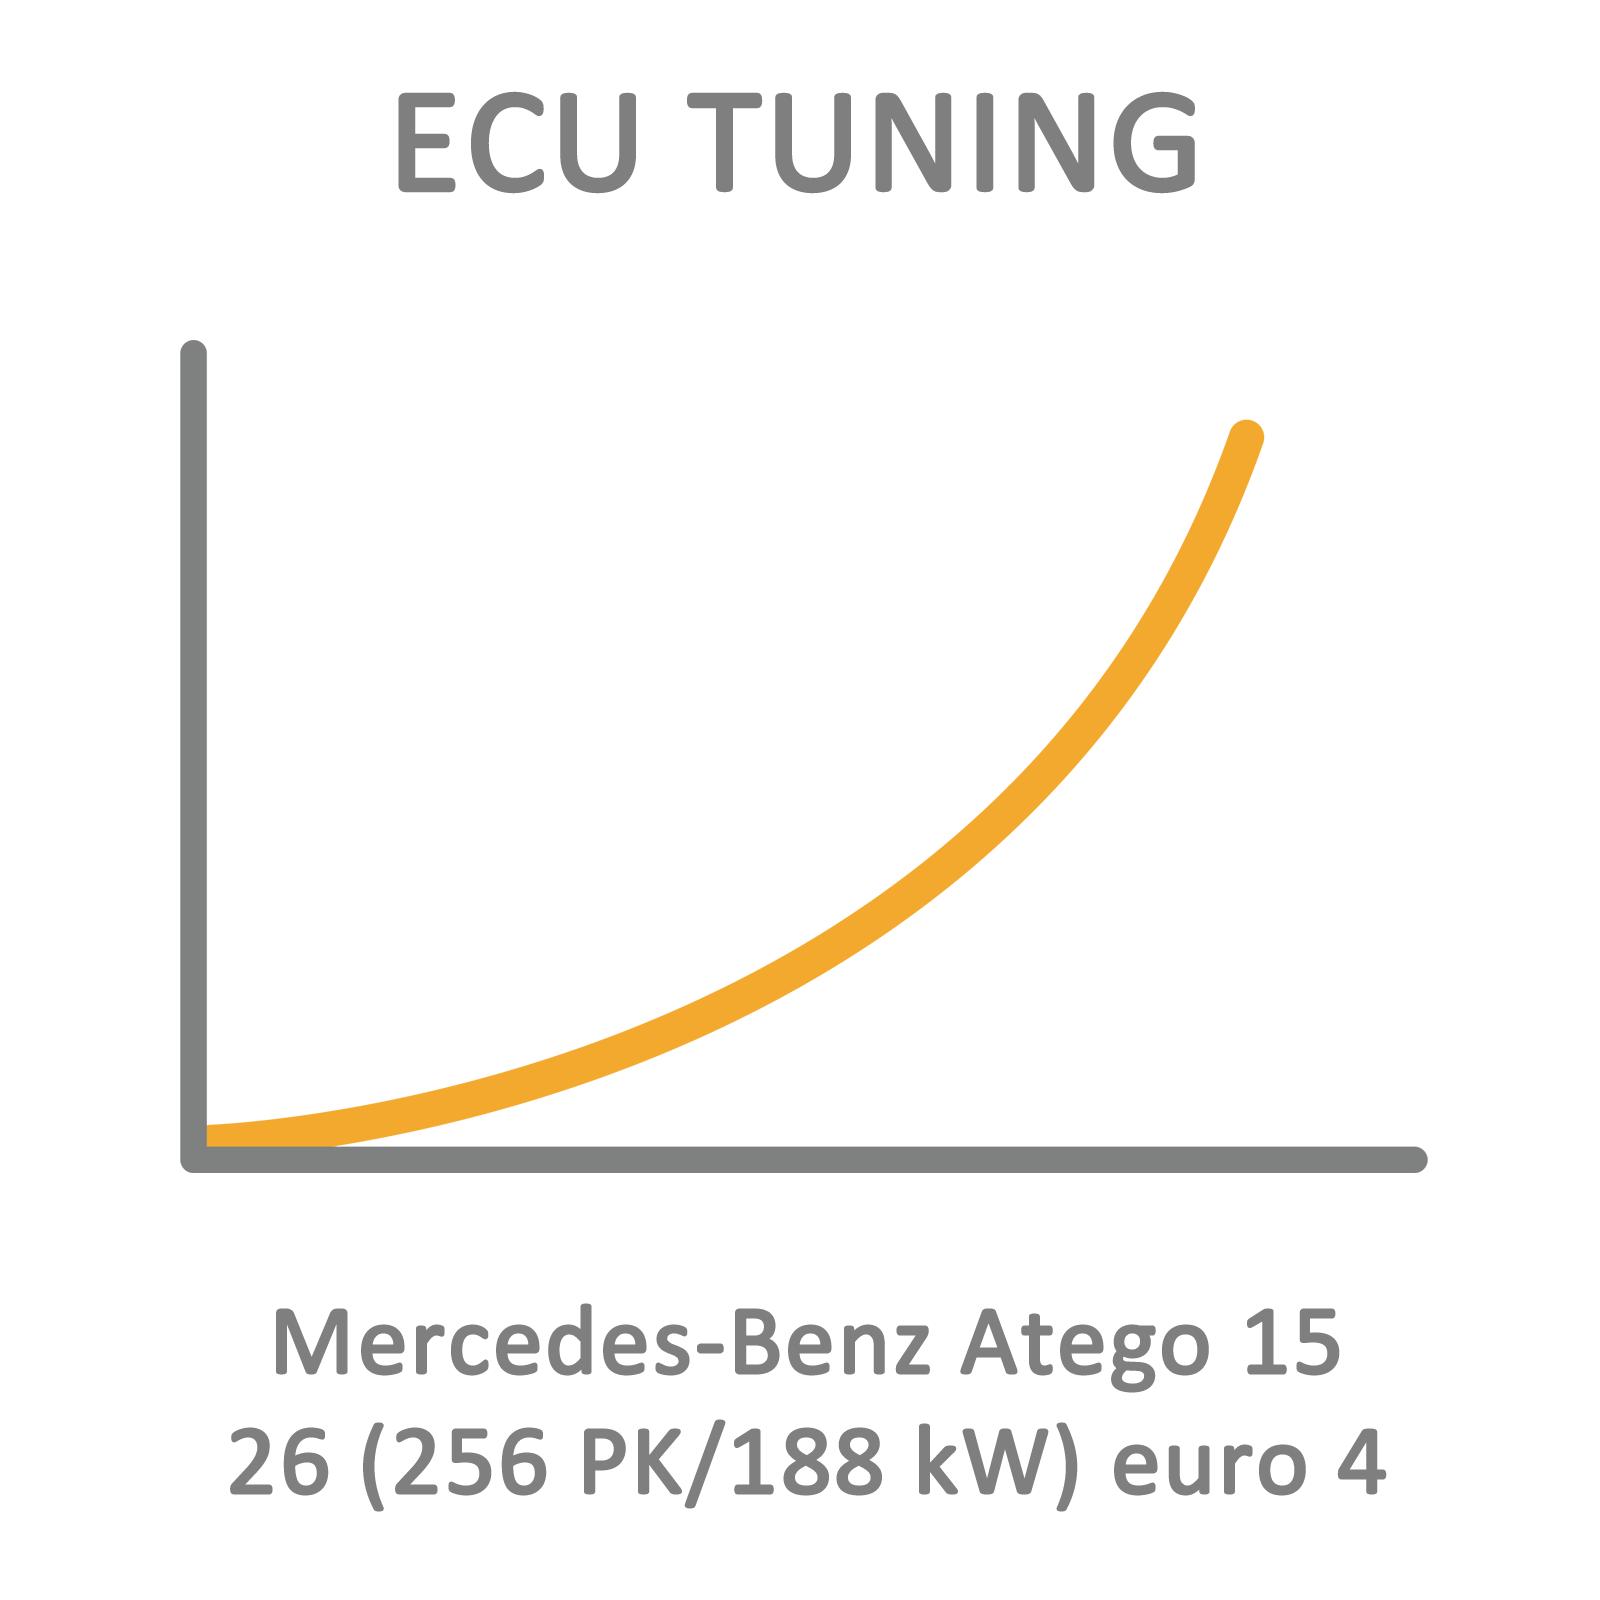 Mercedes-Benz Atego 15 26 (256 PK/188 kW) euro 4 ECU